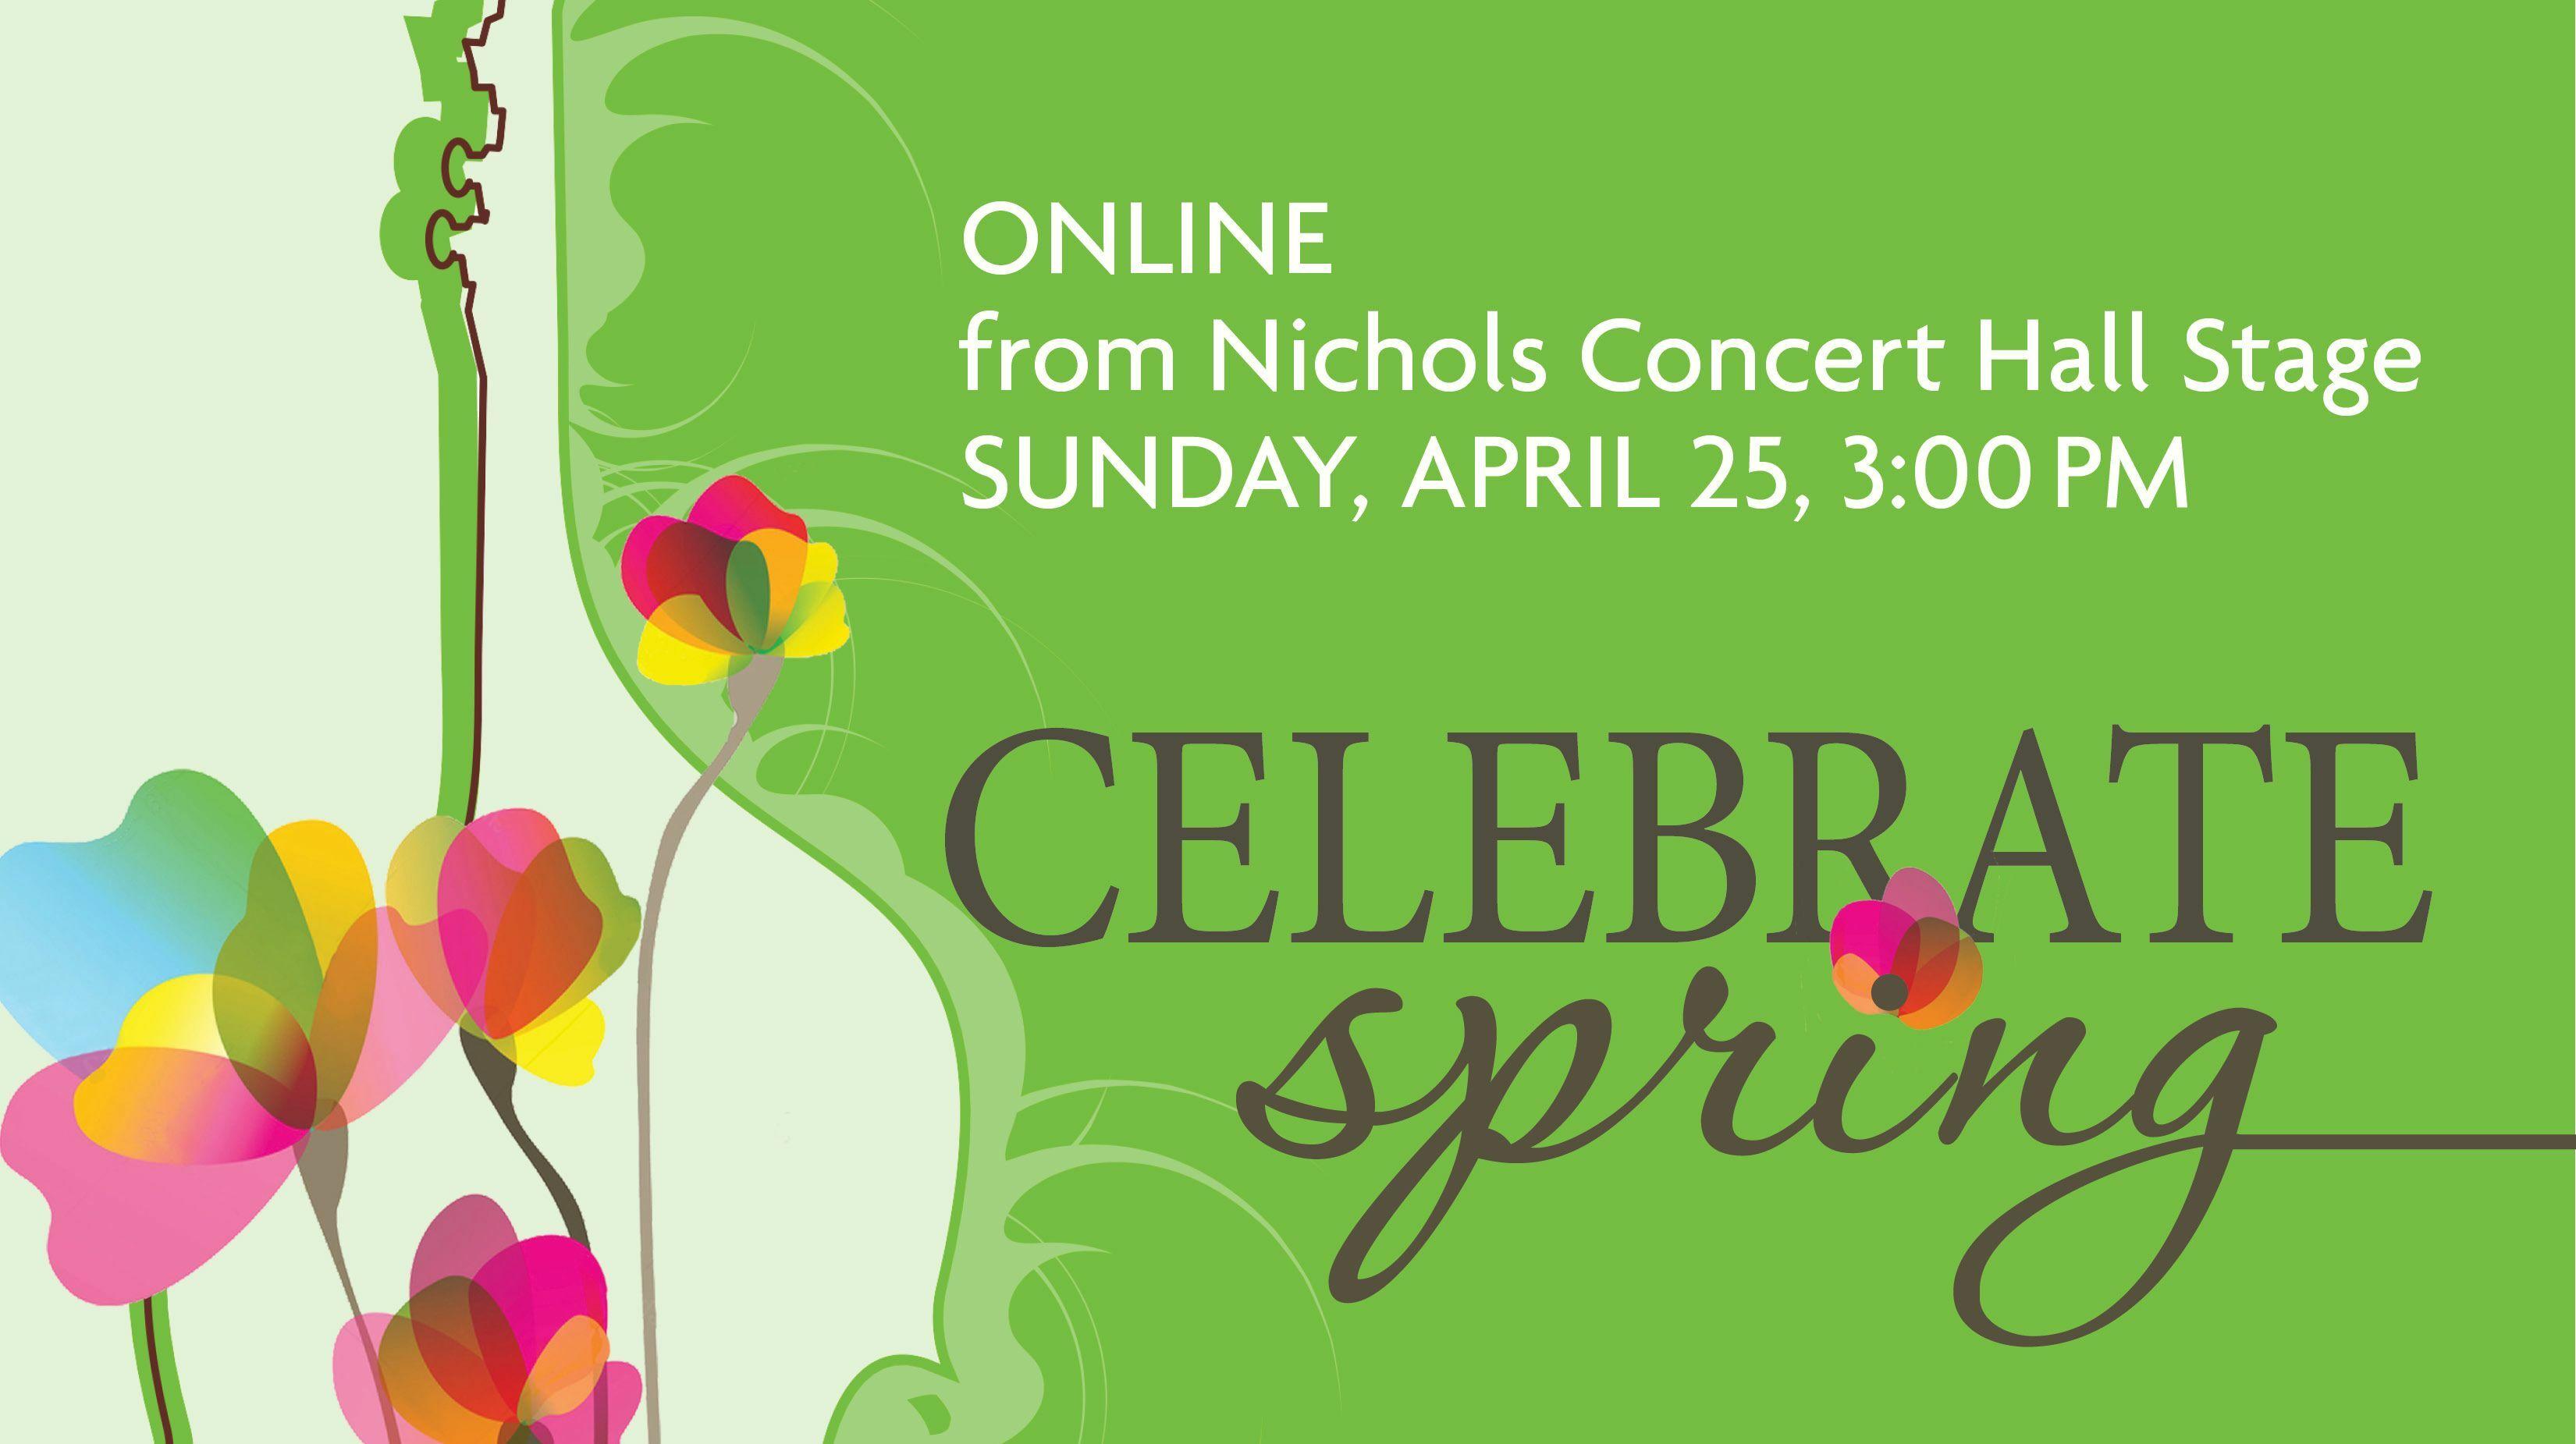 Celebrate Spring - Online